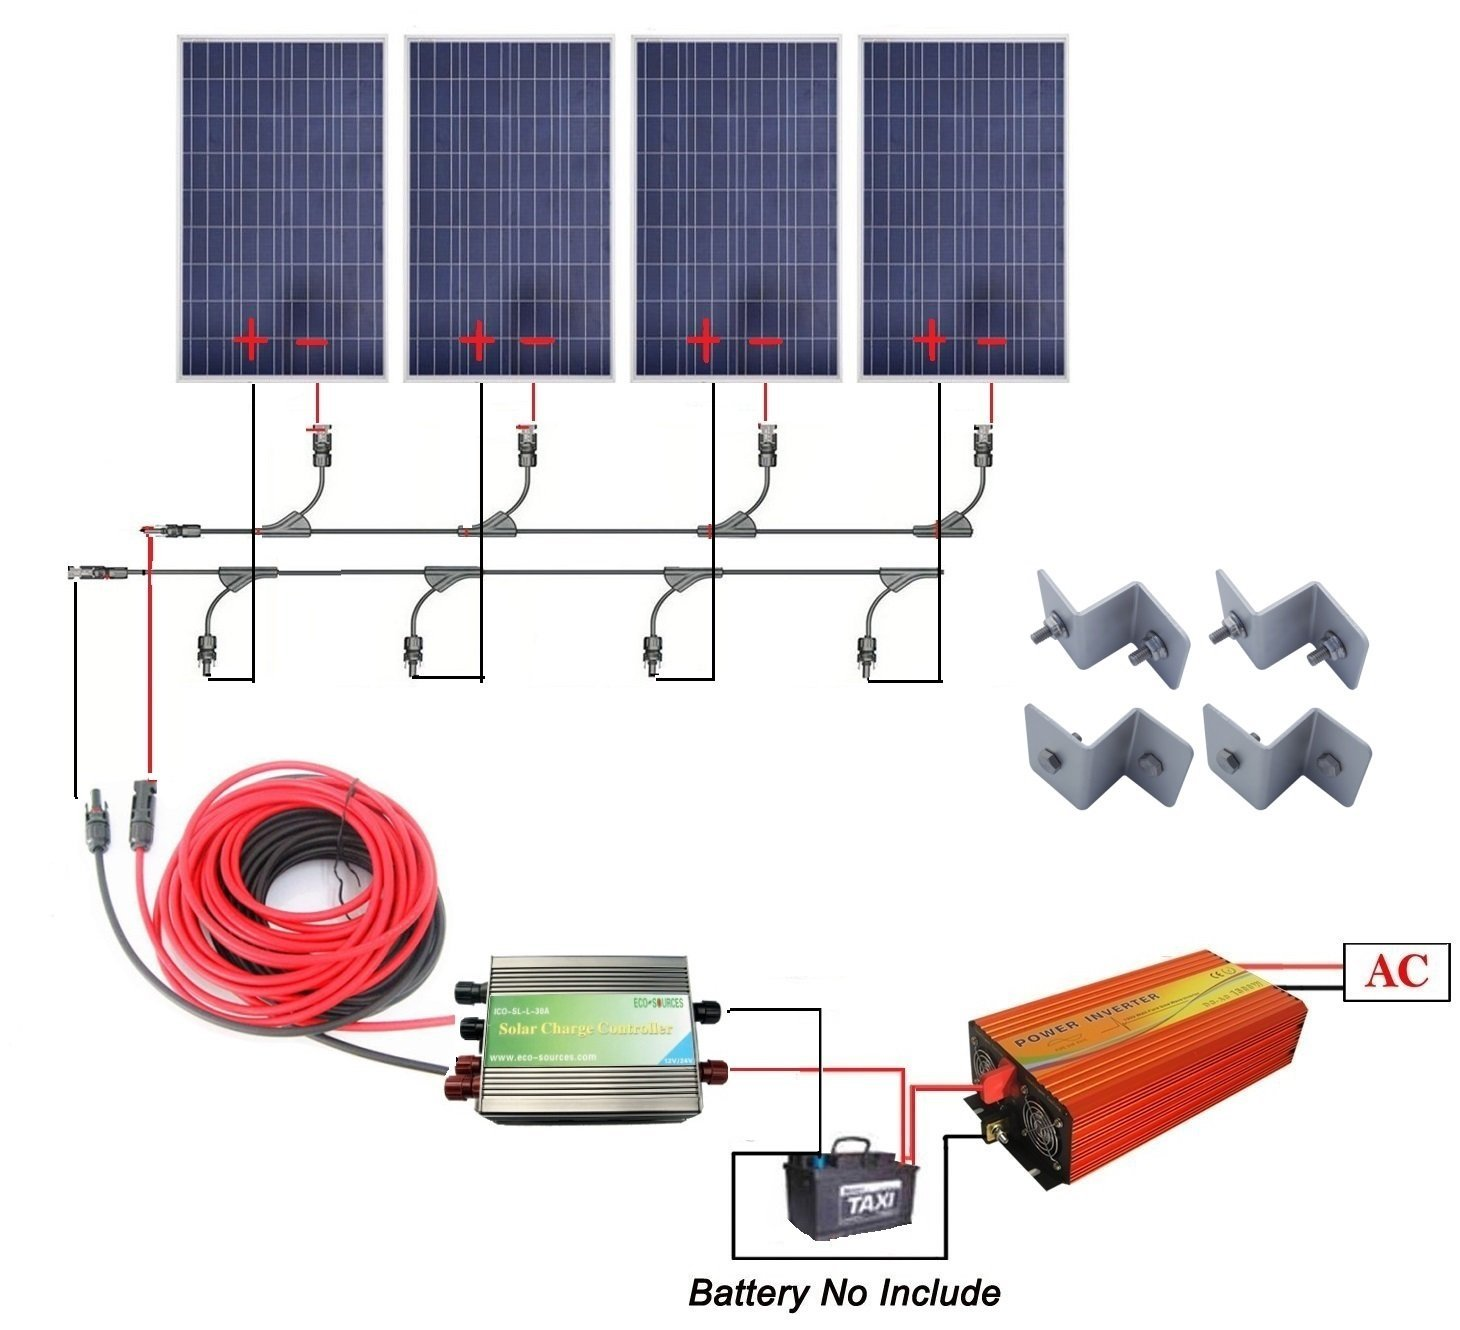 400 Watts Off Grid Solar Power System 4pcs 100w Sine Wavedc Sign Wavesine Wave Diagrampwm Inverterpure Polycrystalline Panel 1000w Pure Inverter 30a Pwm Charge Controller